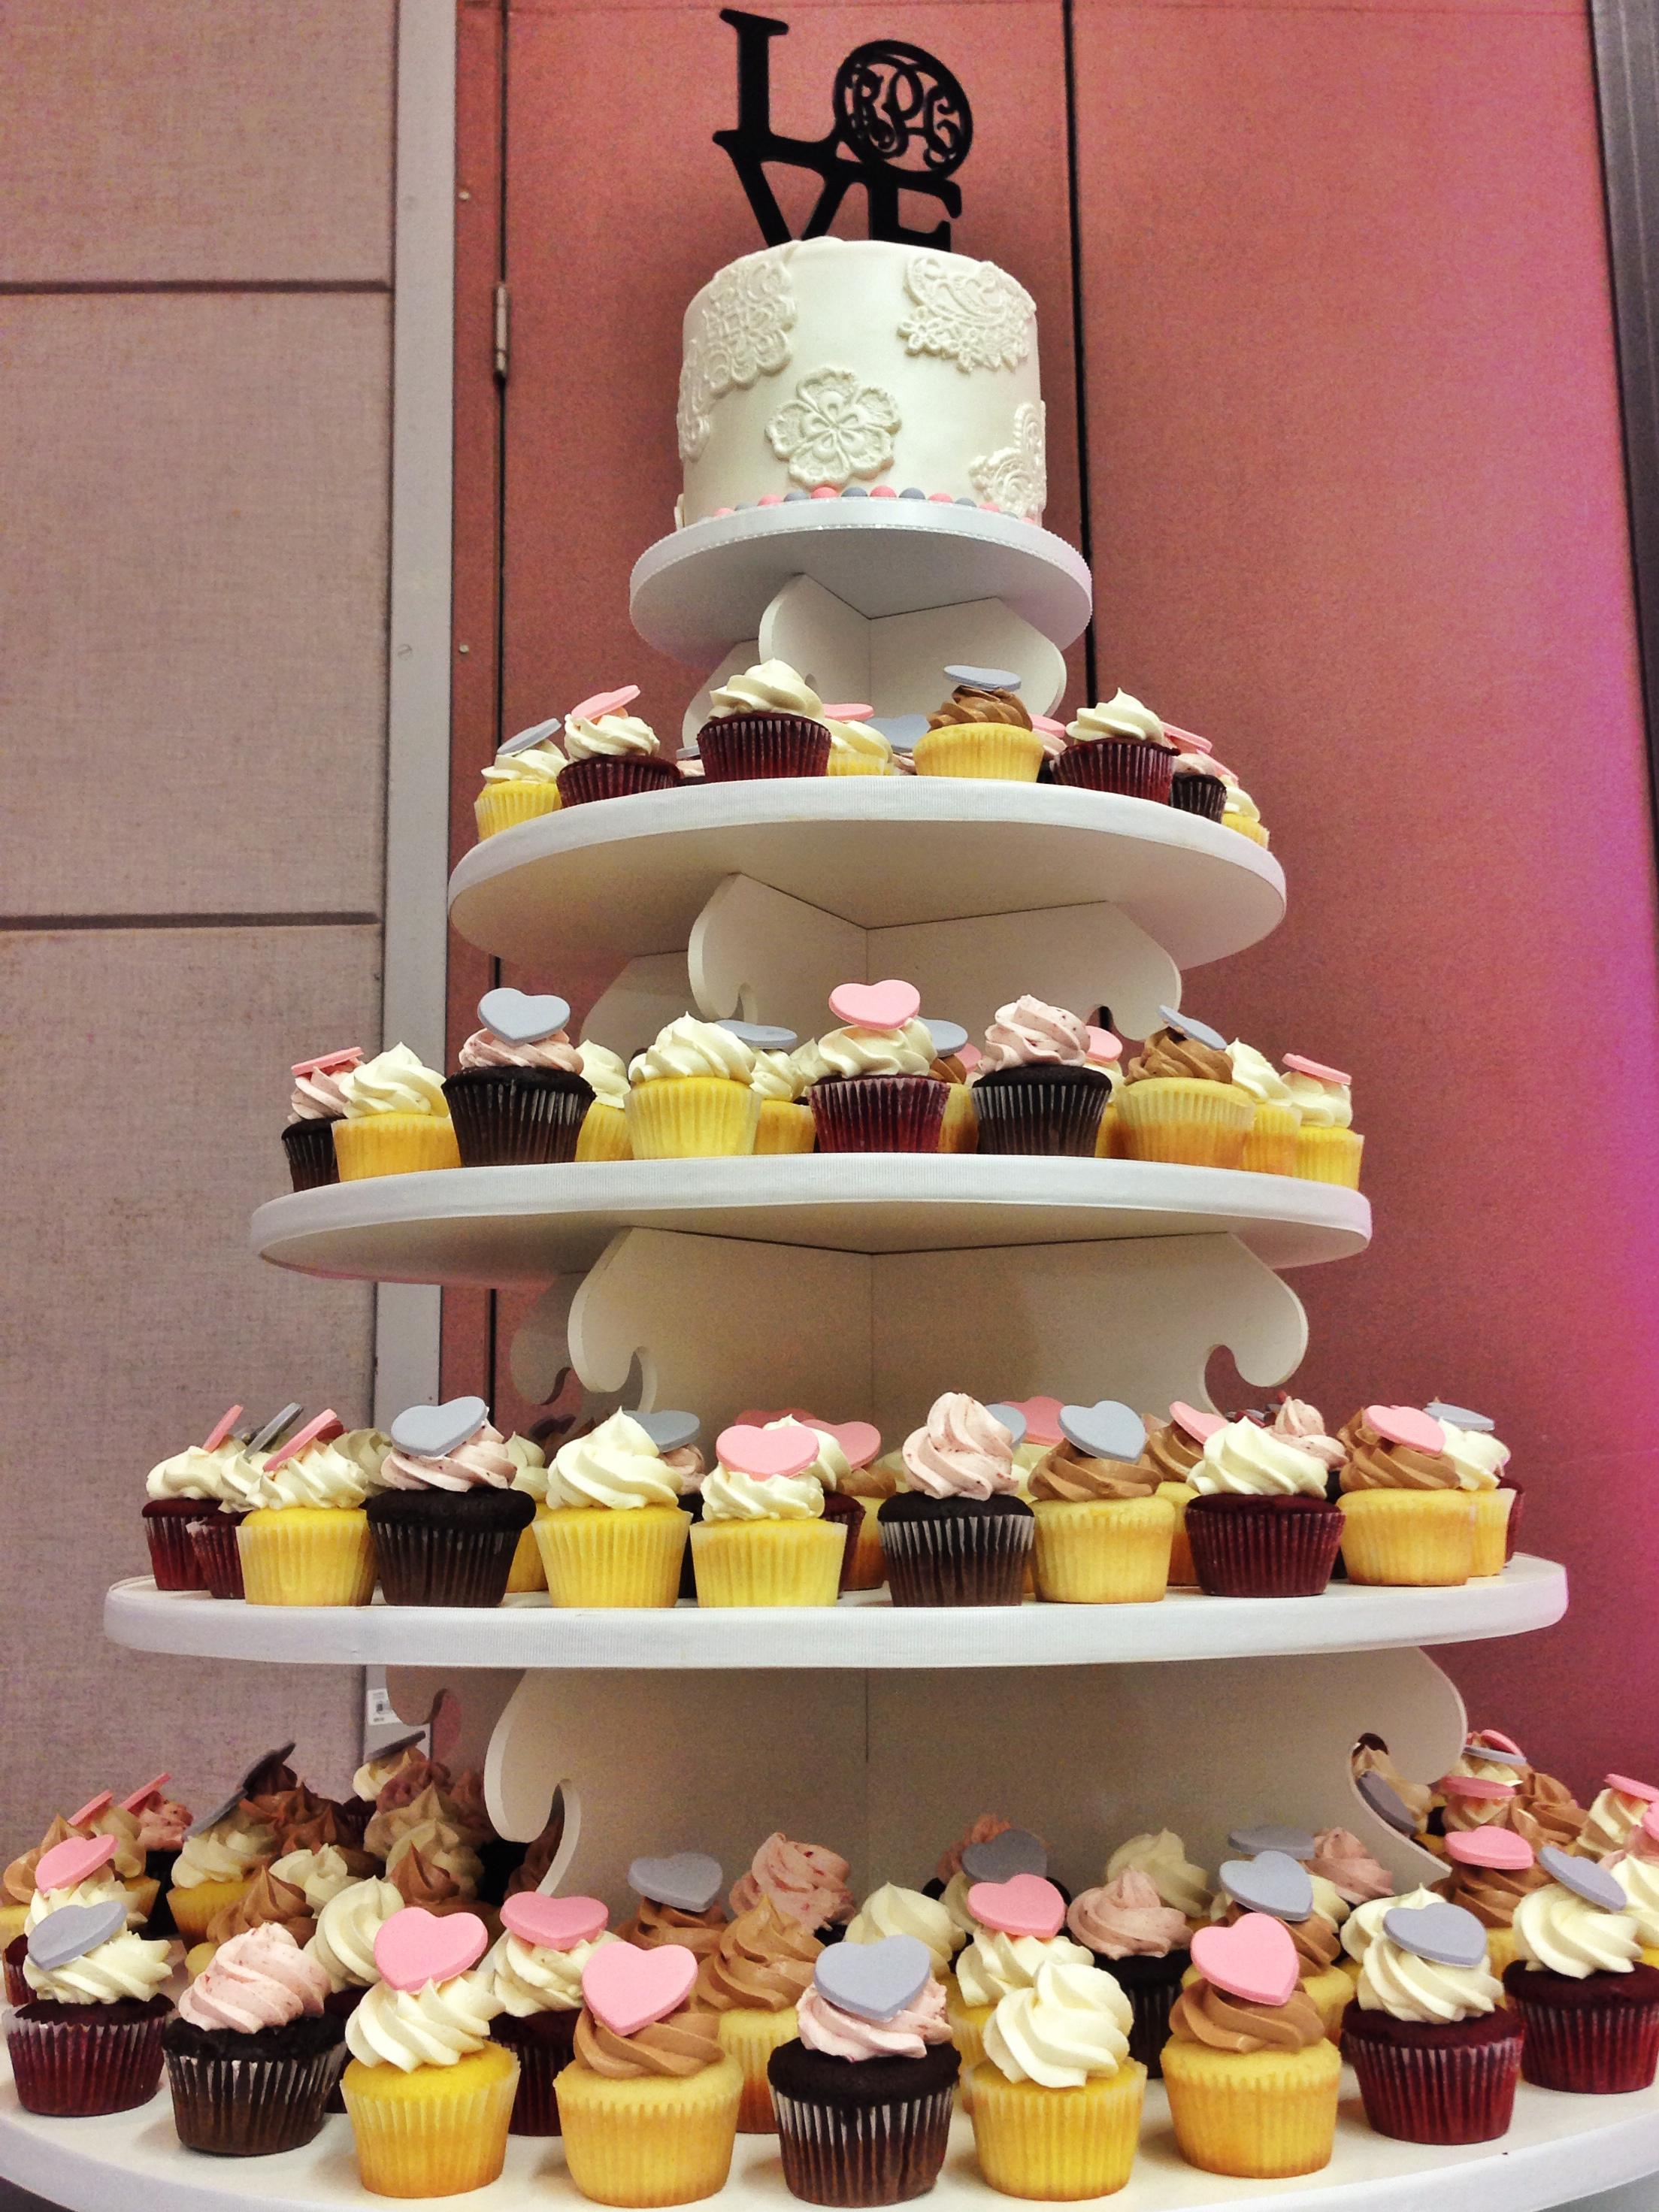 27-cupcake-tower-cake.JPG